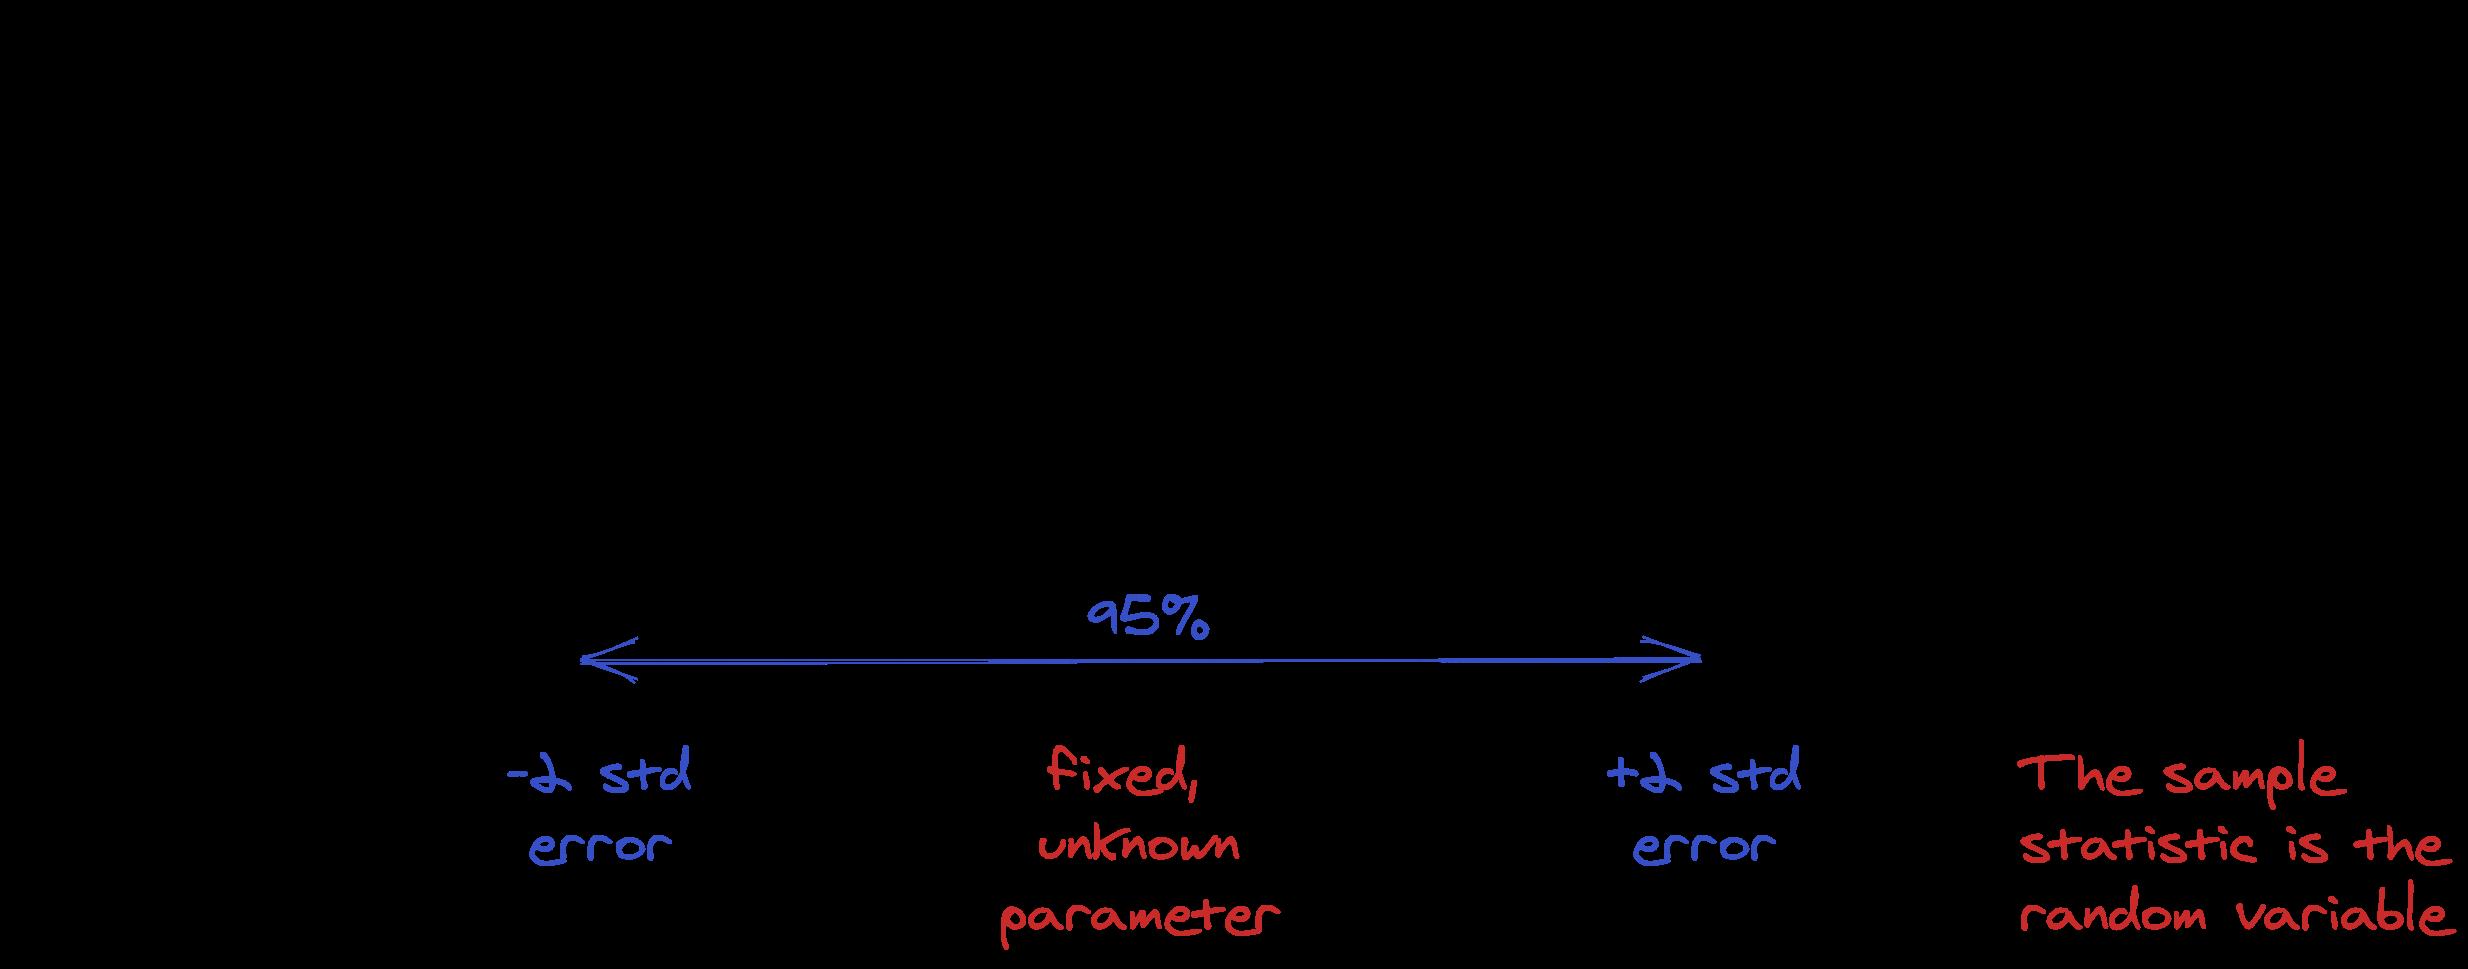 Statistical model for confidence intervals